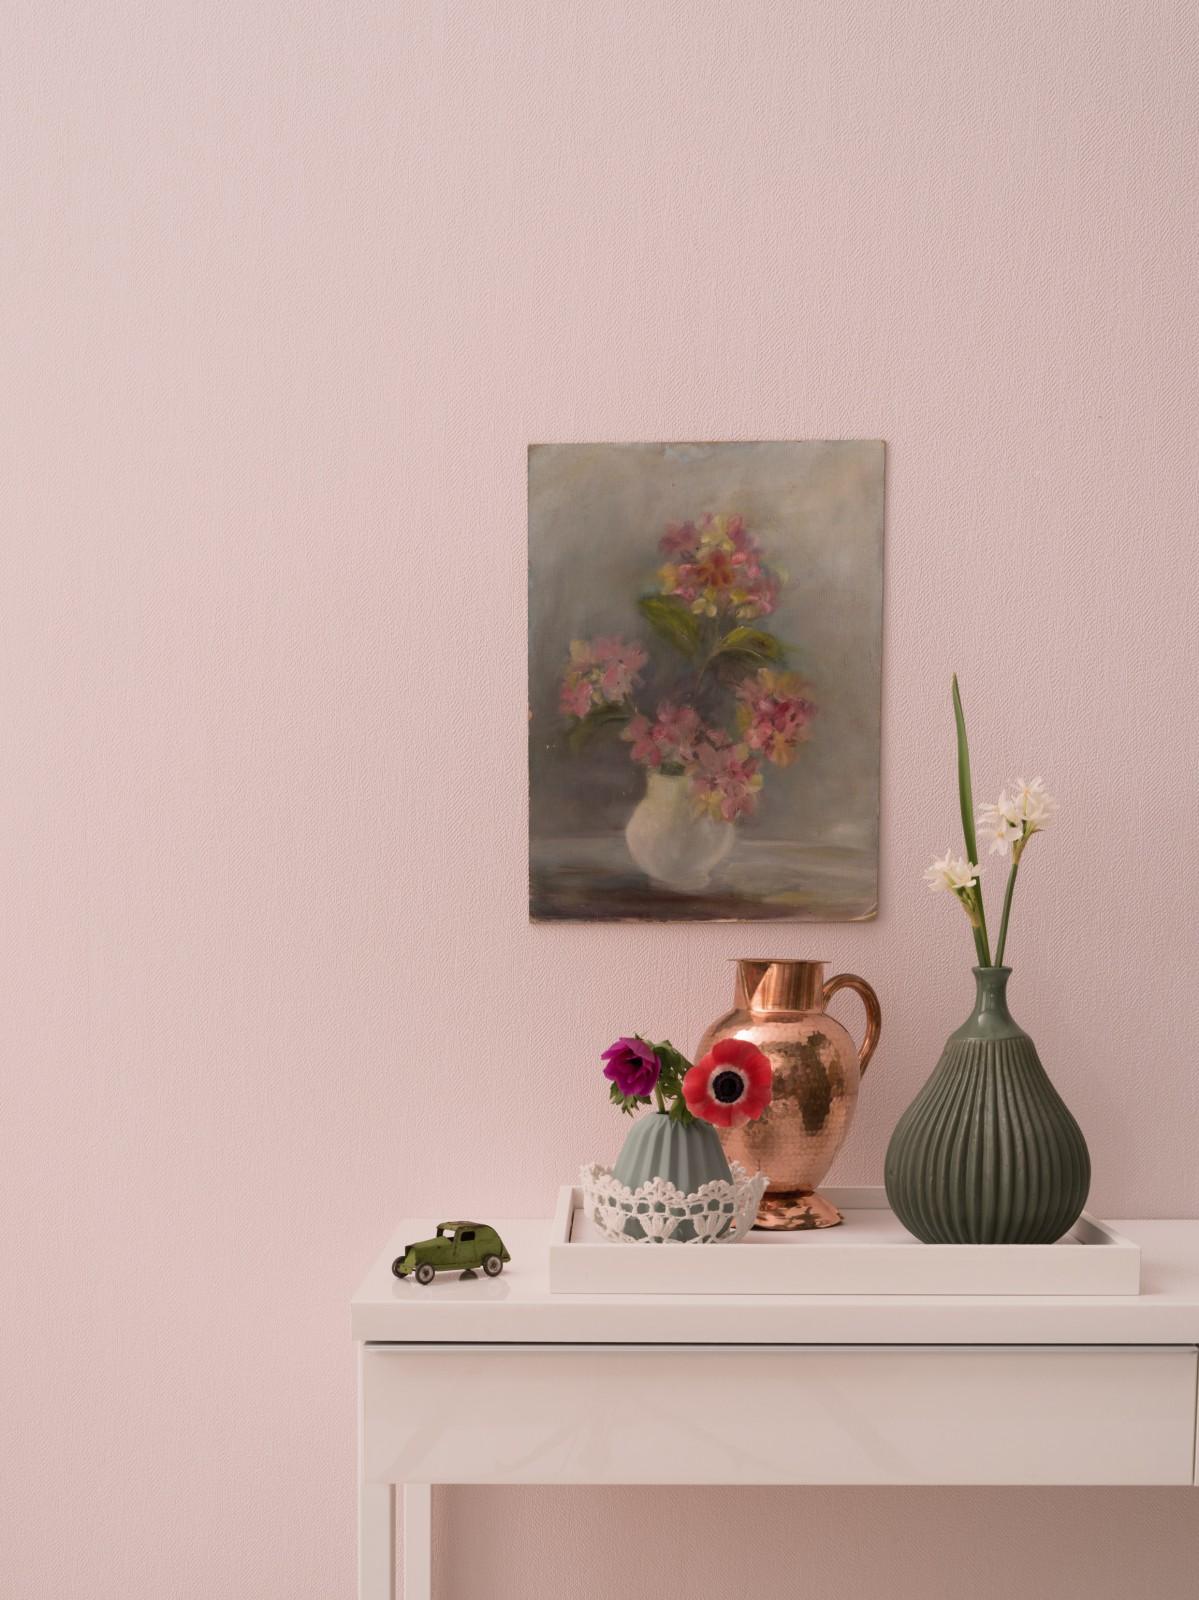 zuhause wohnen tapete einfarbig rosa 57124. Black Bedroom Furniture Sets. Home Design Ideas